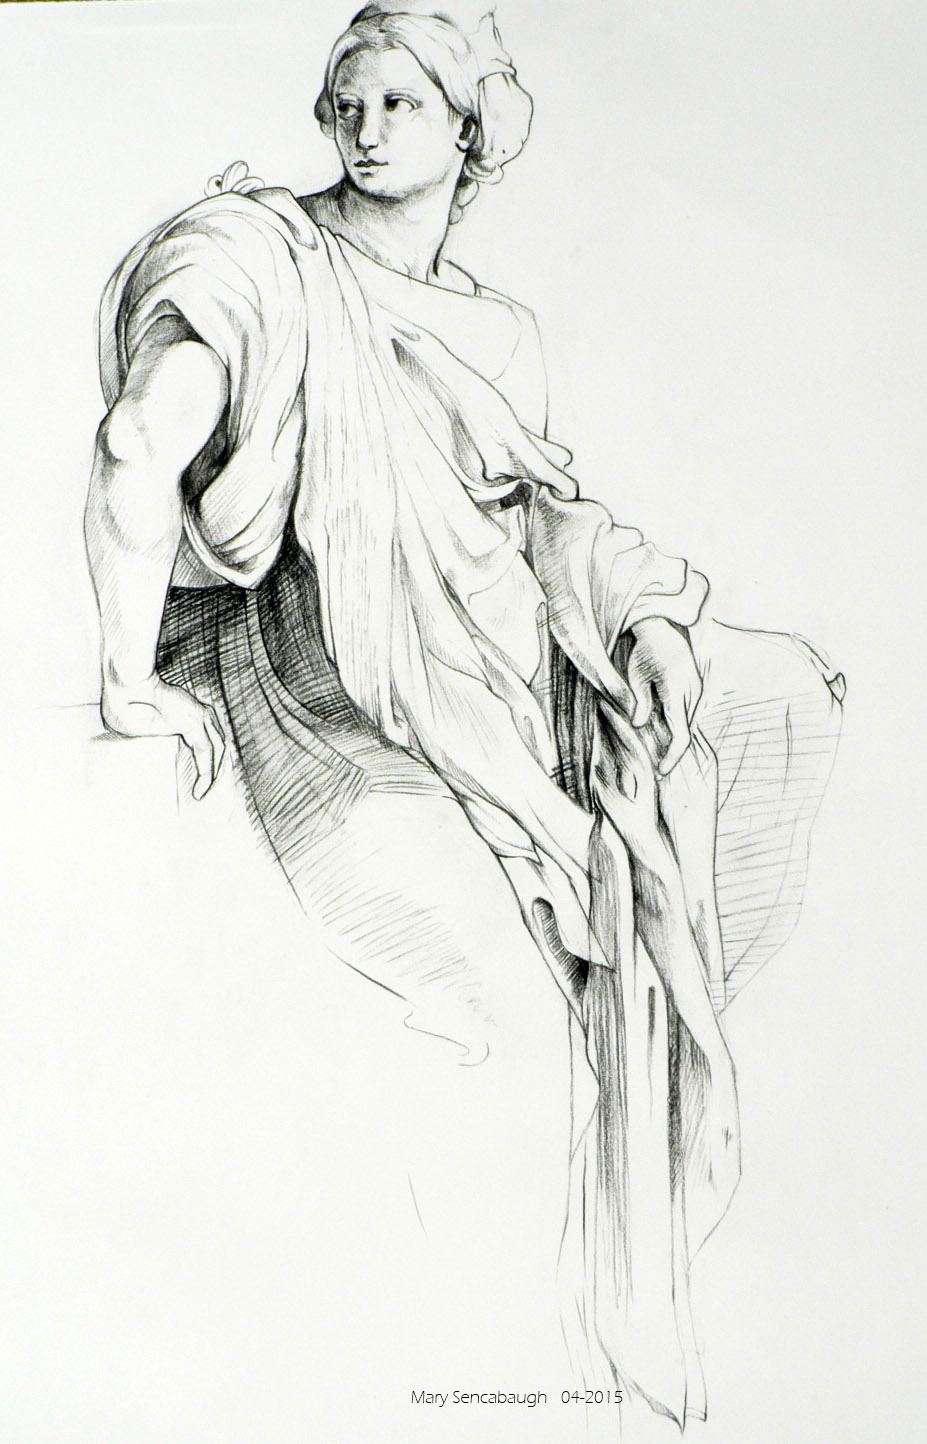 Raphael Copy Exercise